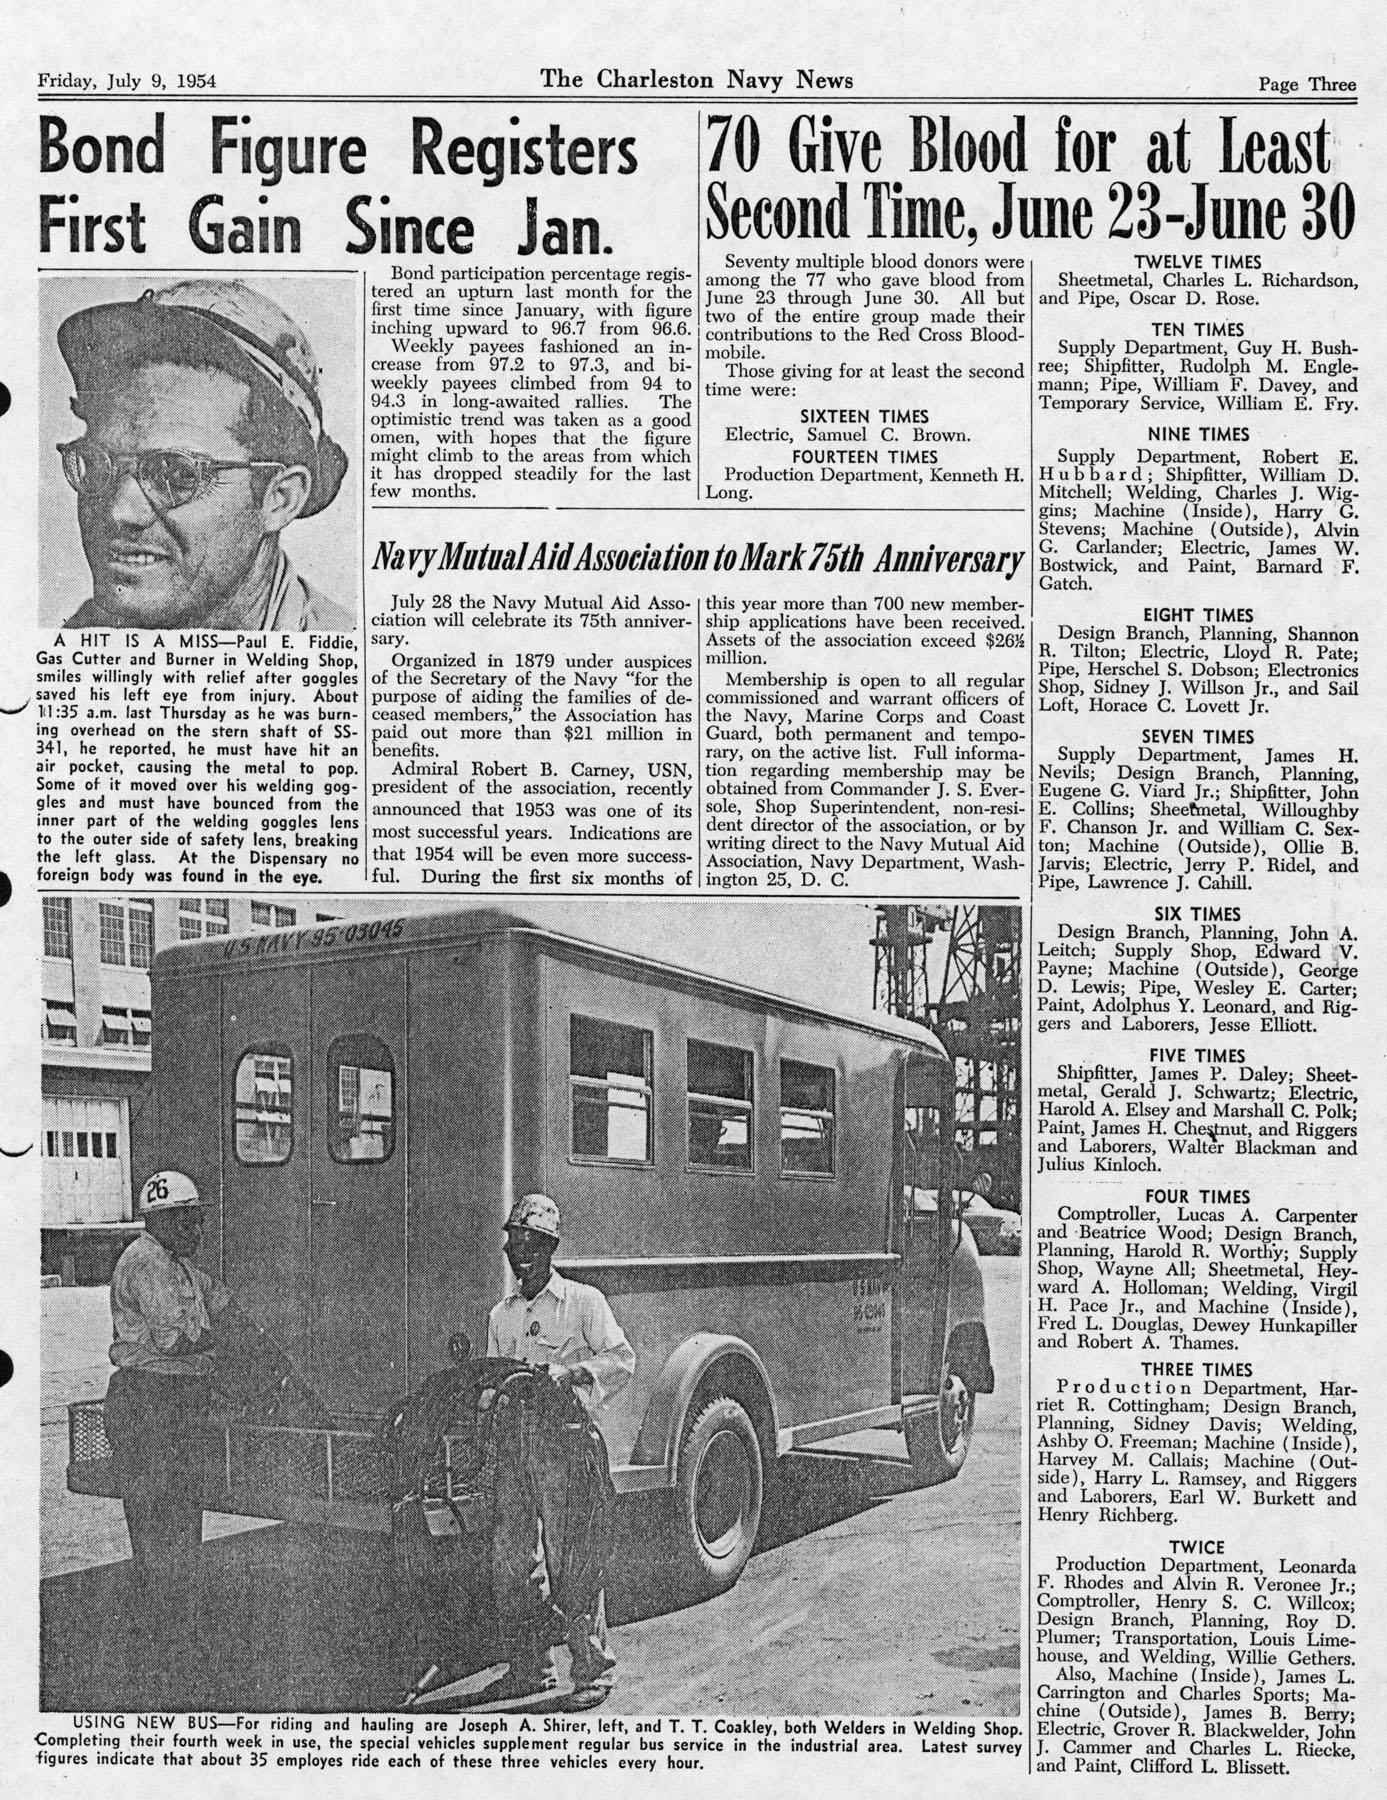 The Charleston Navy News, Volume 13, Edition 1, page iii